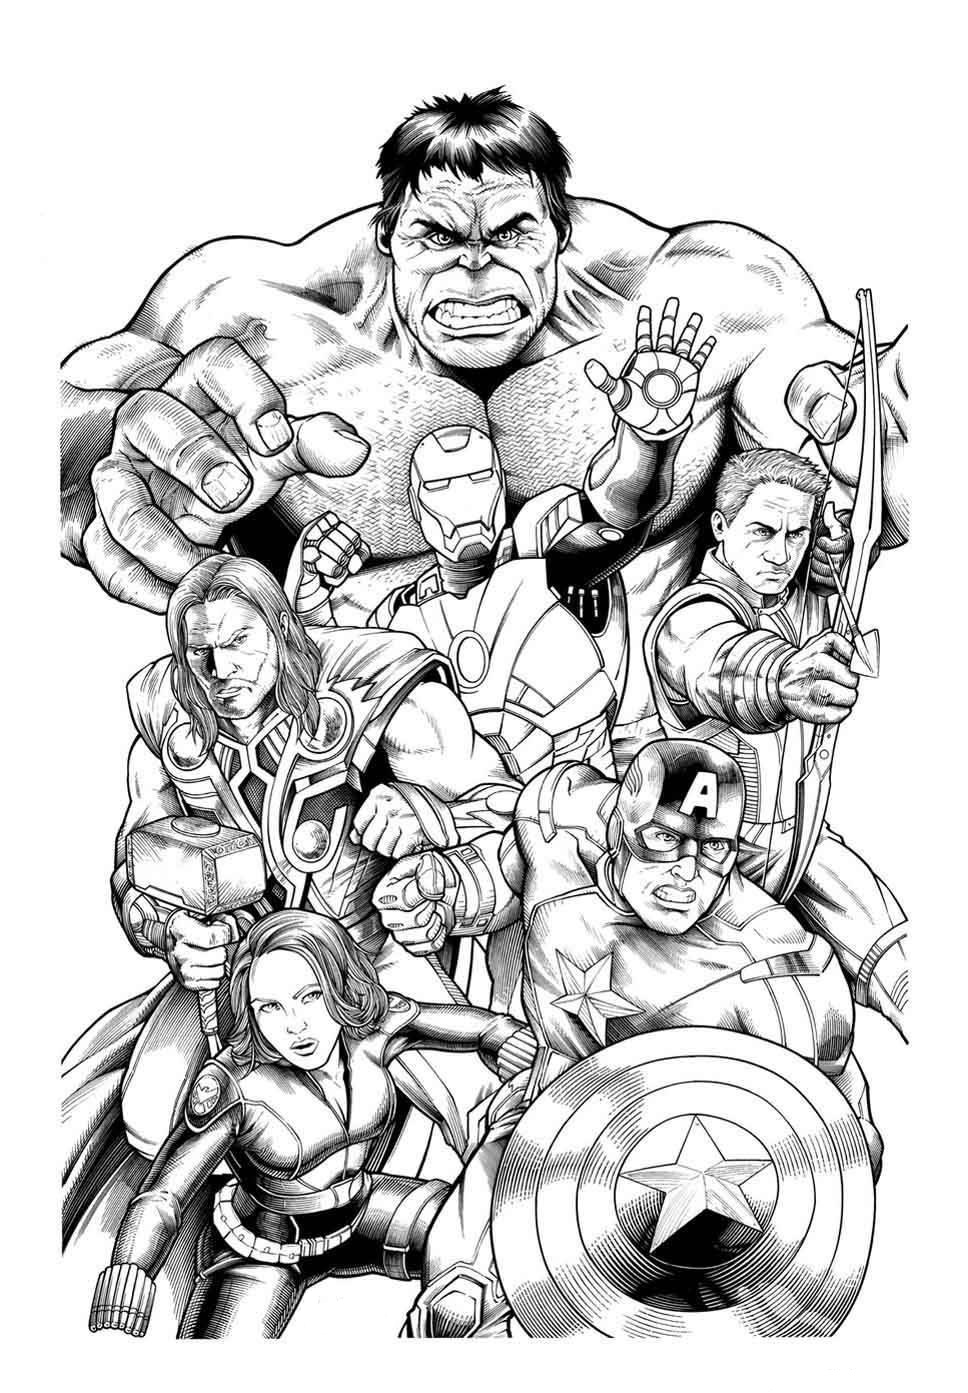 Team Members of Avengers